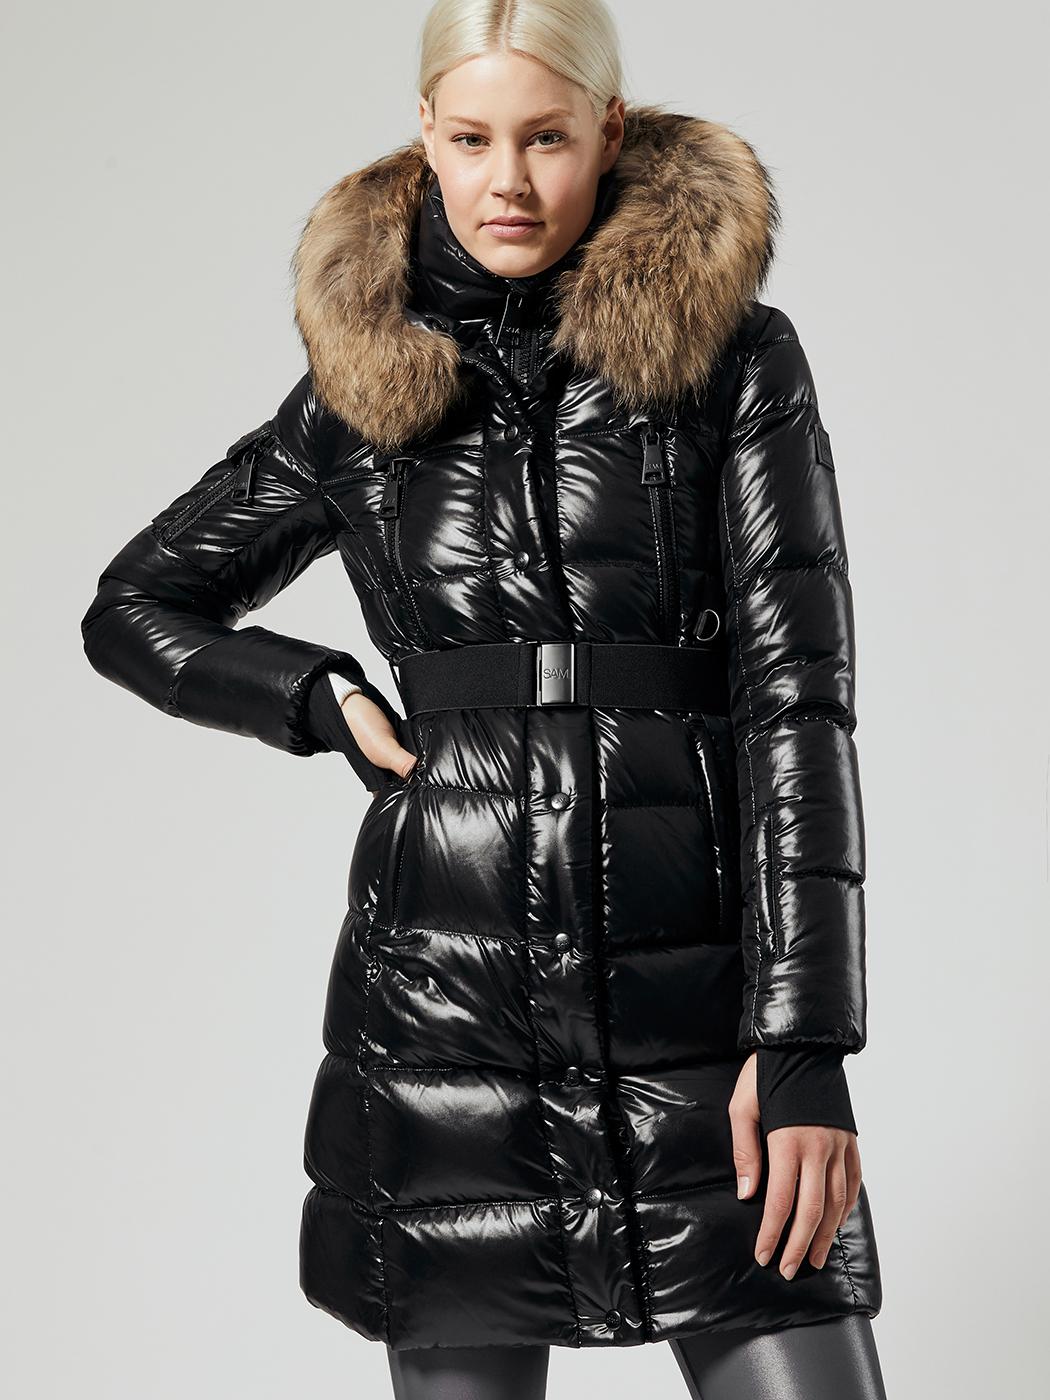 Sam Infinity Jet Fashion Activewear Life Puffer Jacket Women Fashion Coat Fashion [ 1400 x 1050 Pixel ]